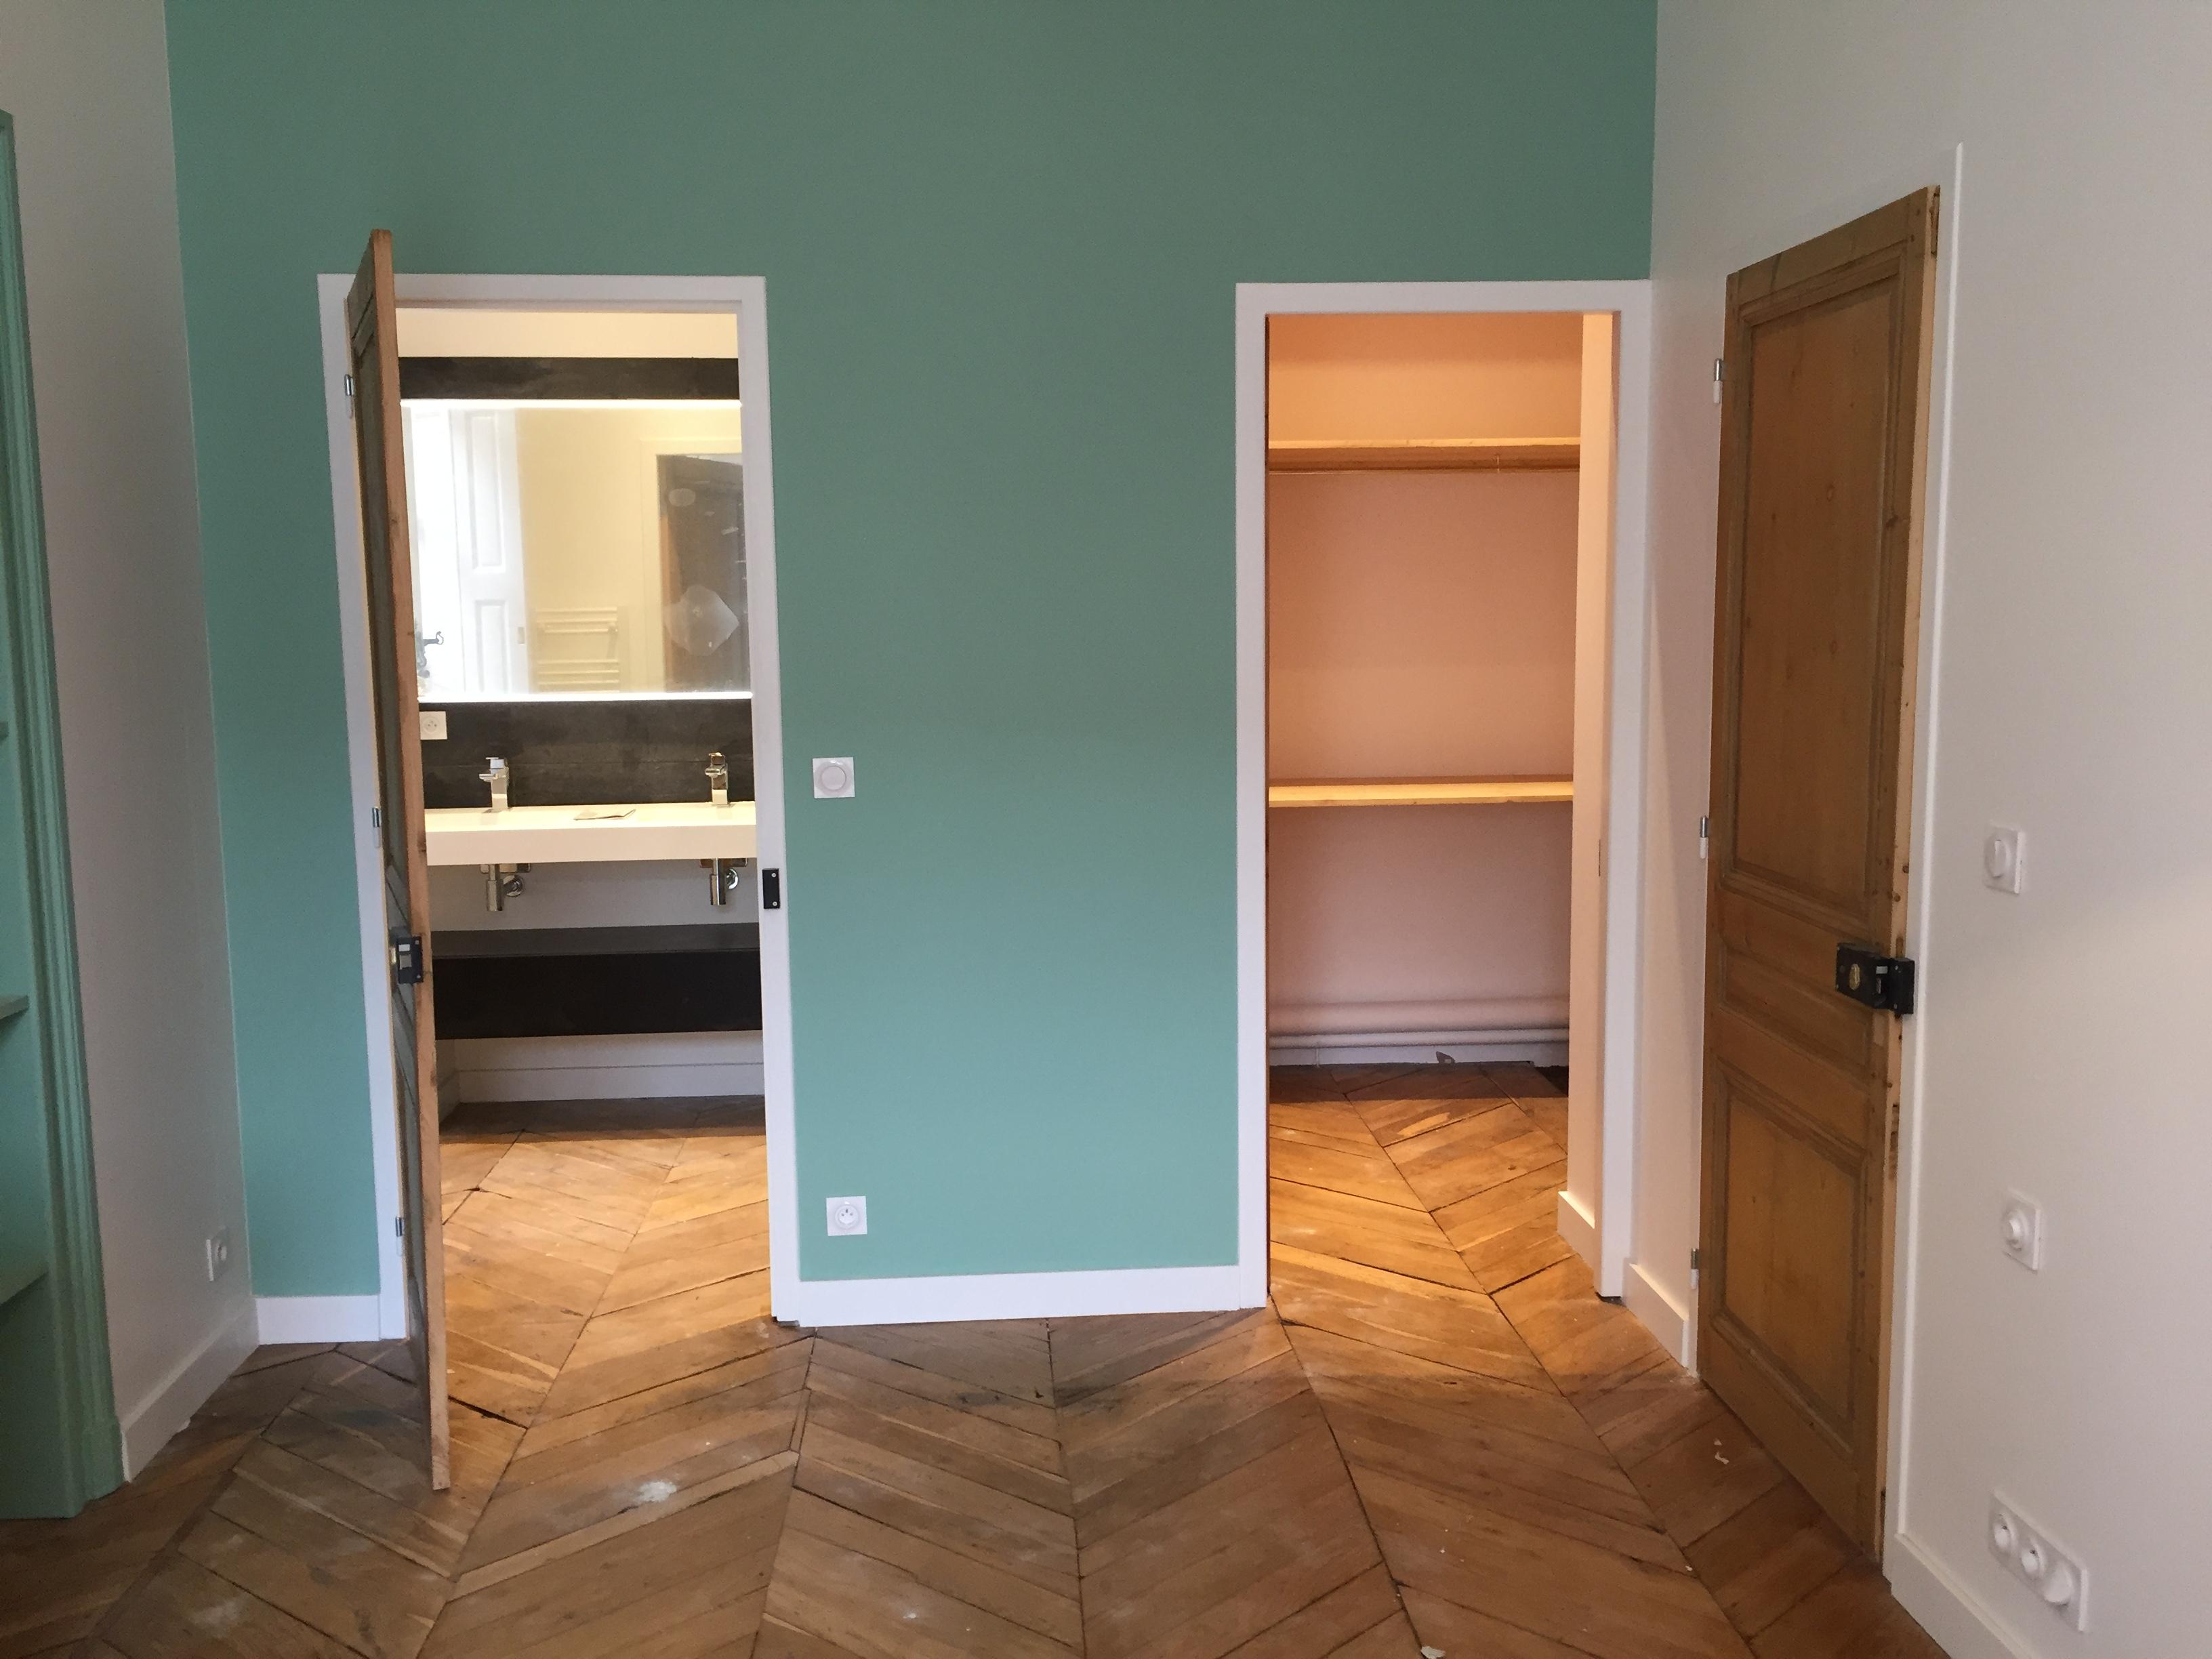 nos r alisations axe lectricit electricien lyon 9. Black Bedroom Furniture Sets. Home Design Ideas